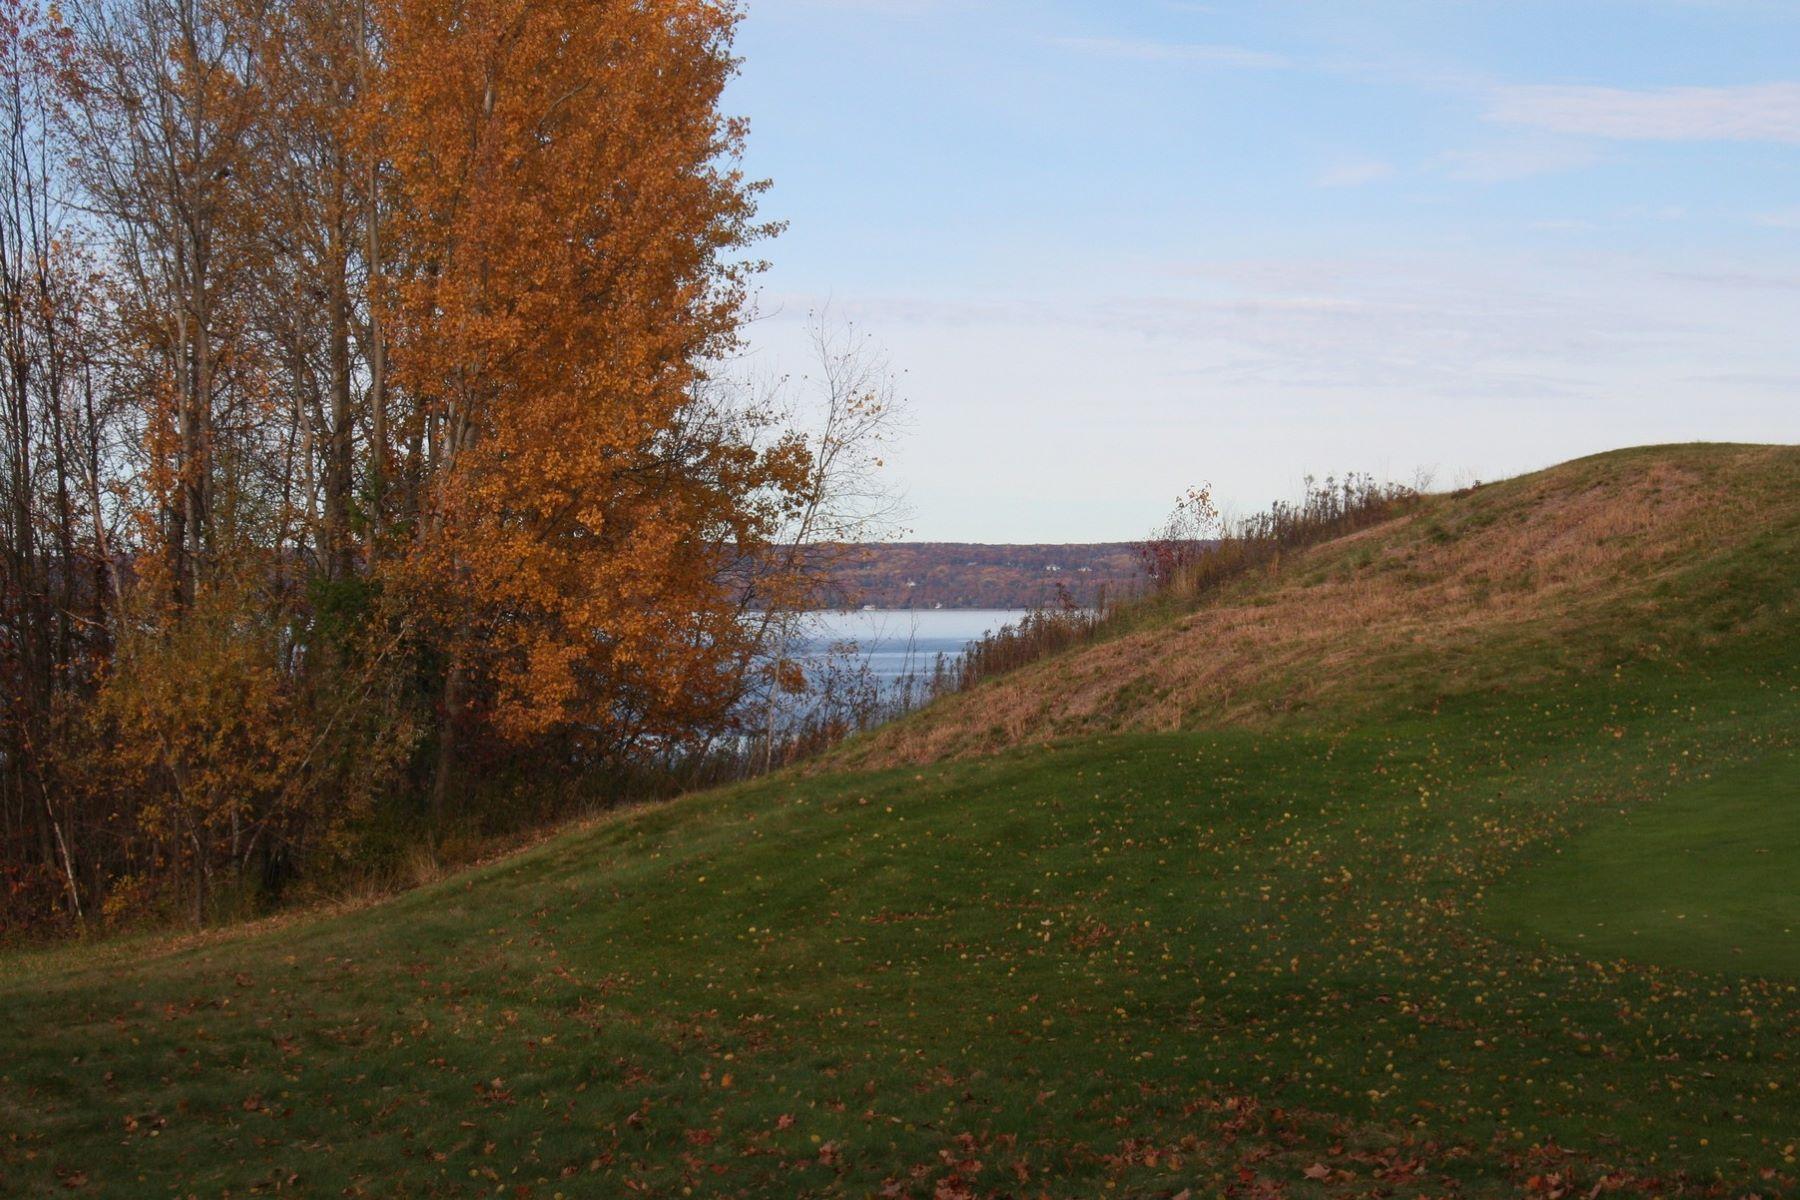 Land for Sale at Coastal Woods 33 5694 Coastal Woods Court Bay Harbor, Michigan 49770 United States